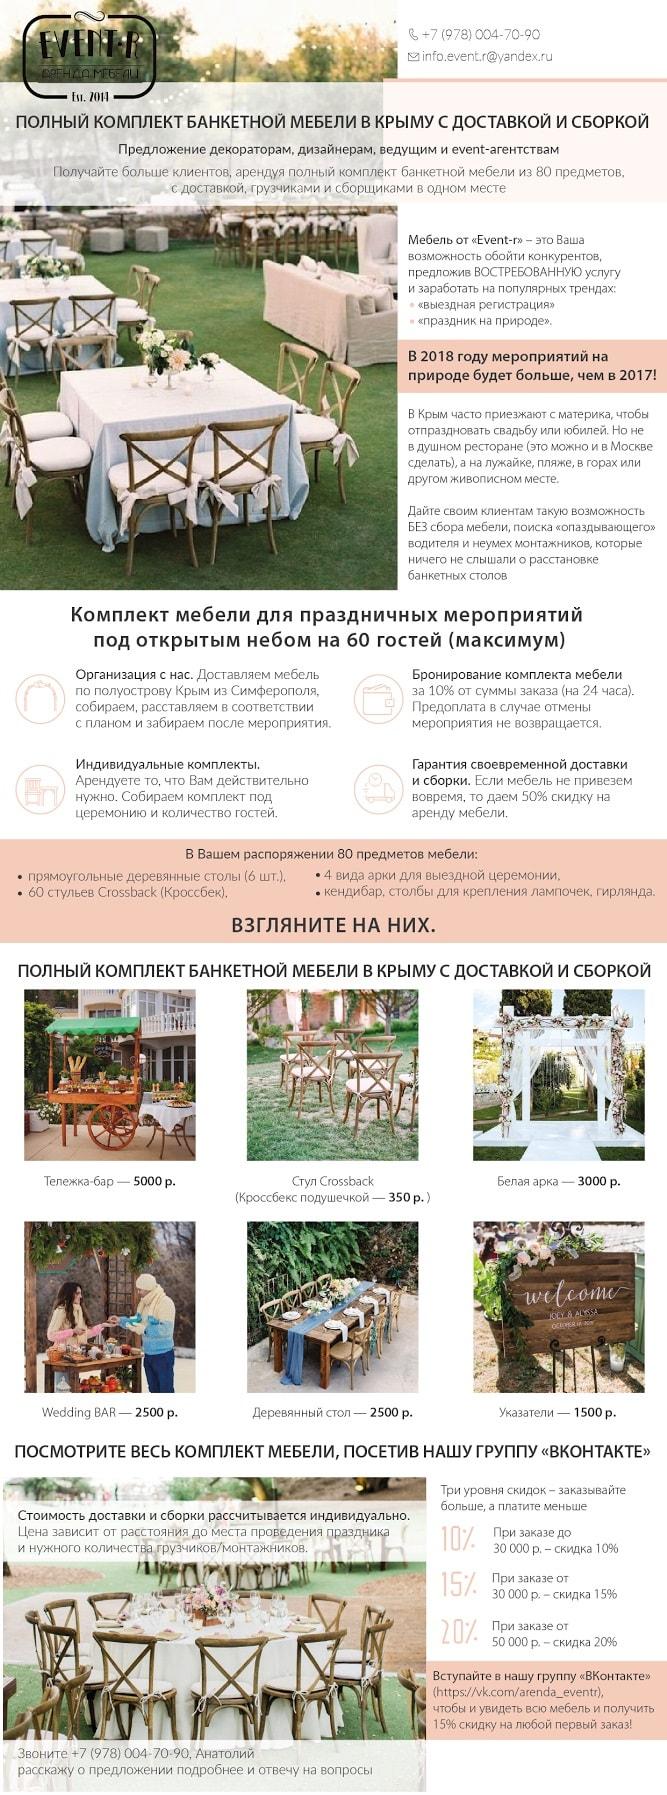 Коммерческое предложение по аренде мебели-min